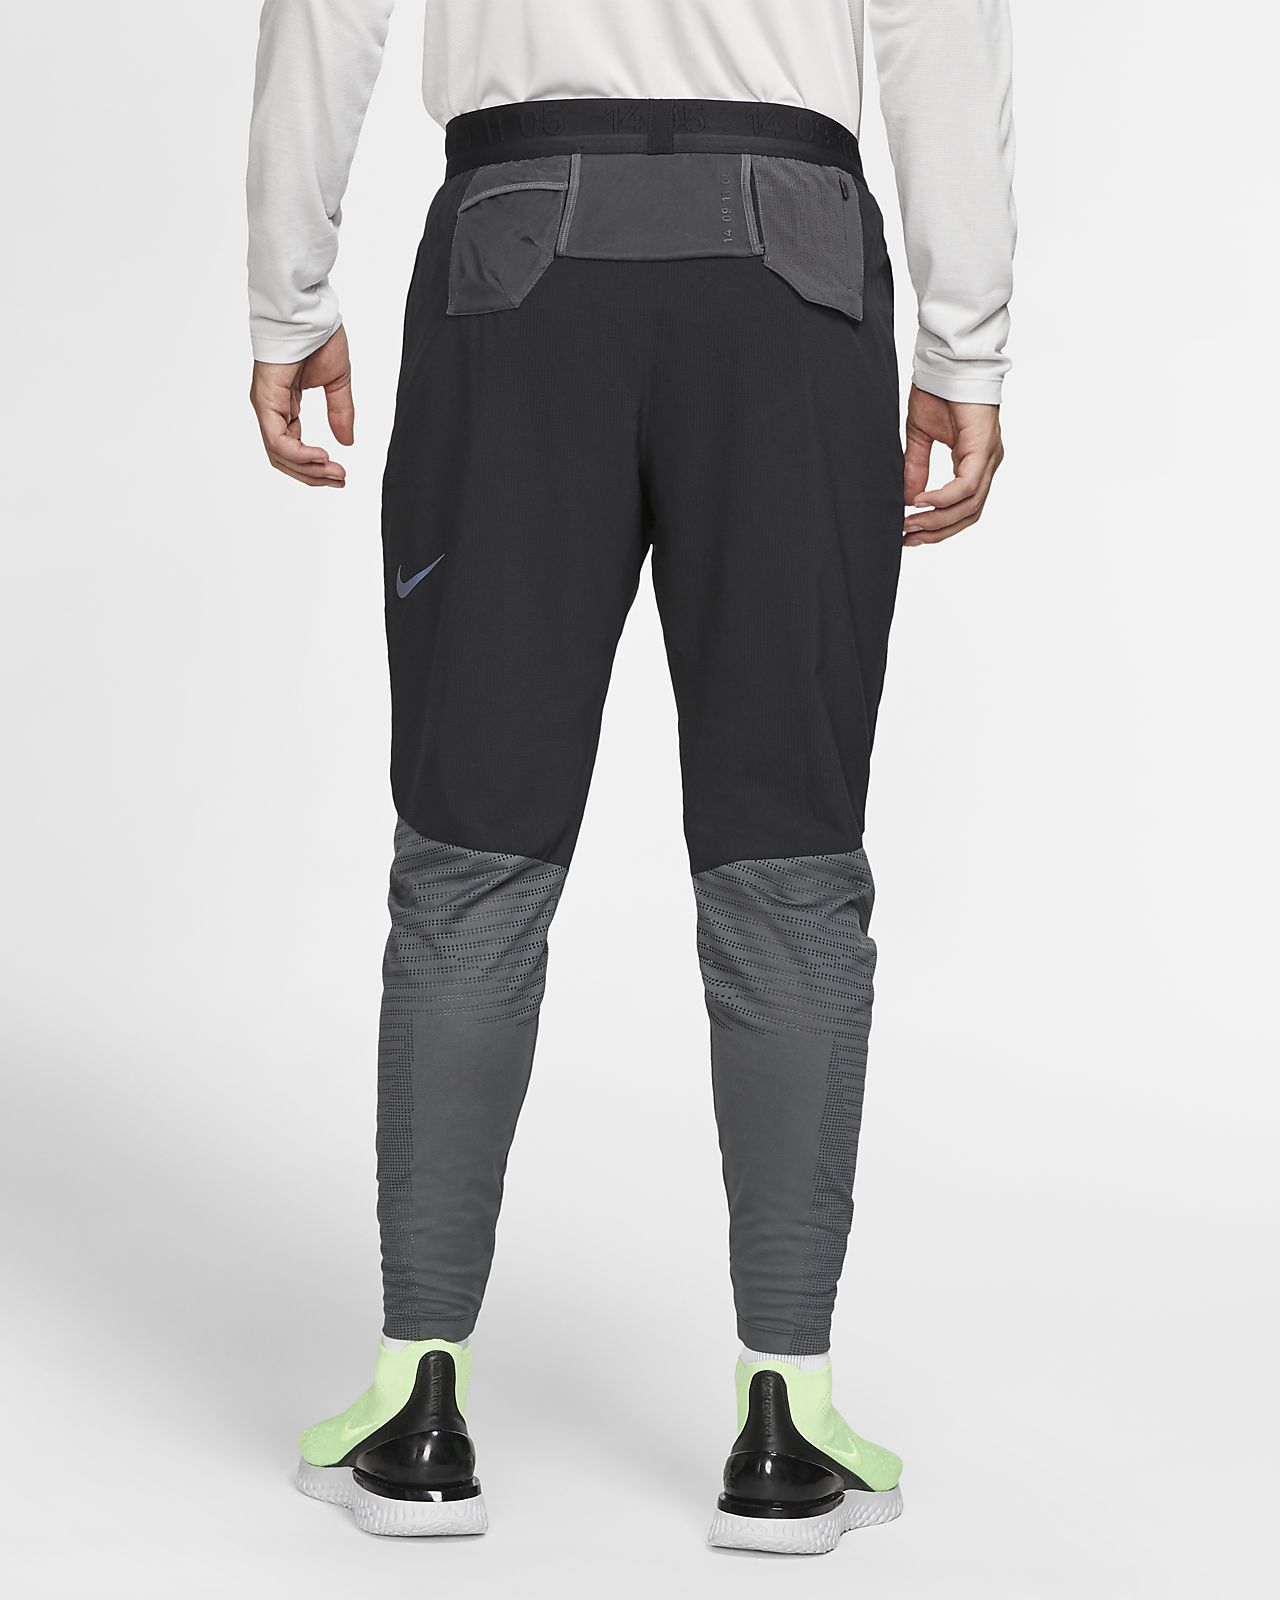 Nike lauftights tech schwarz sport herren running hosen,nike